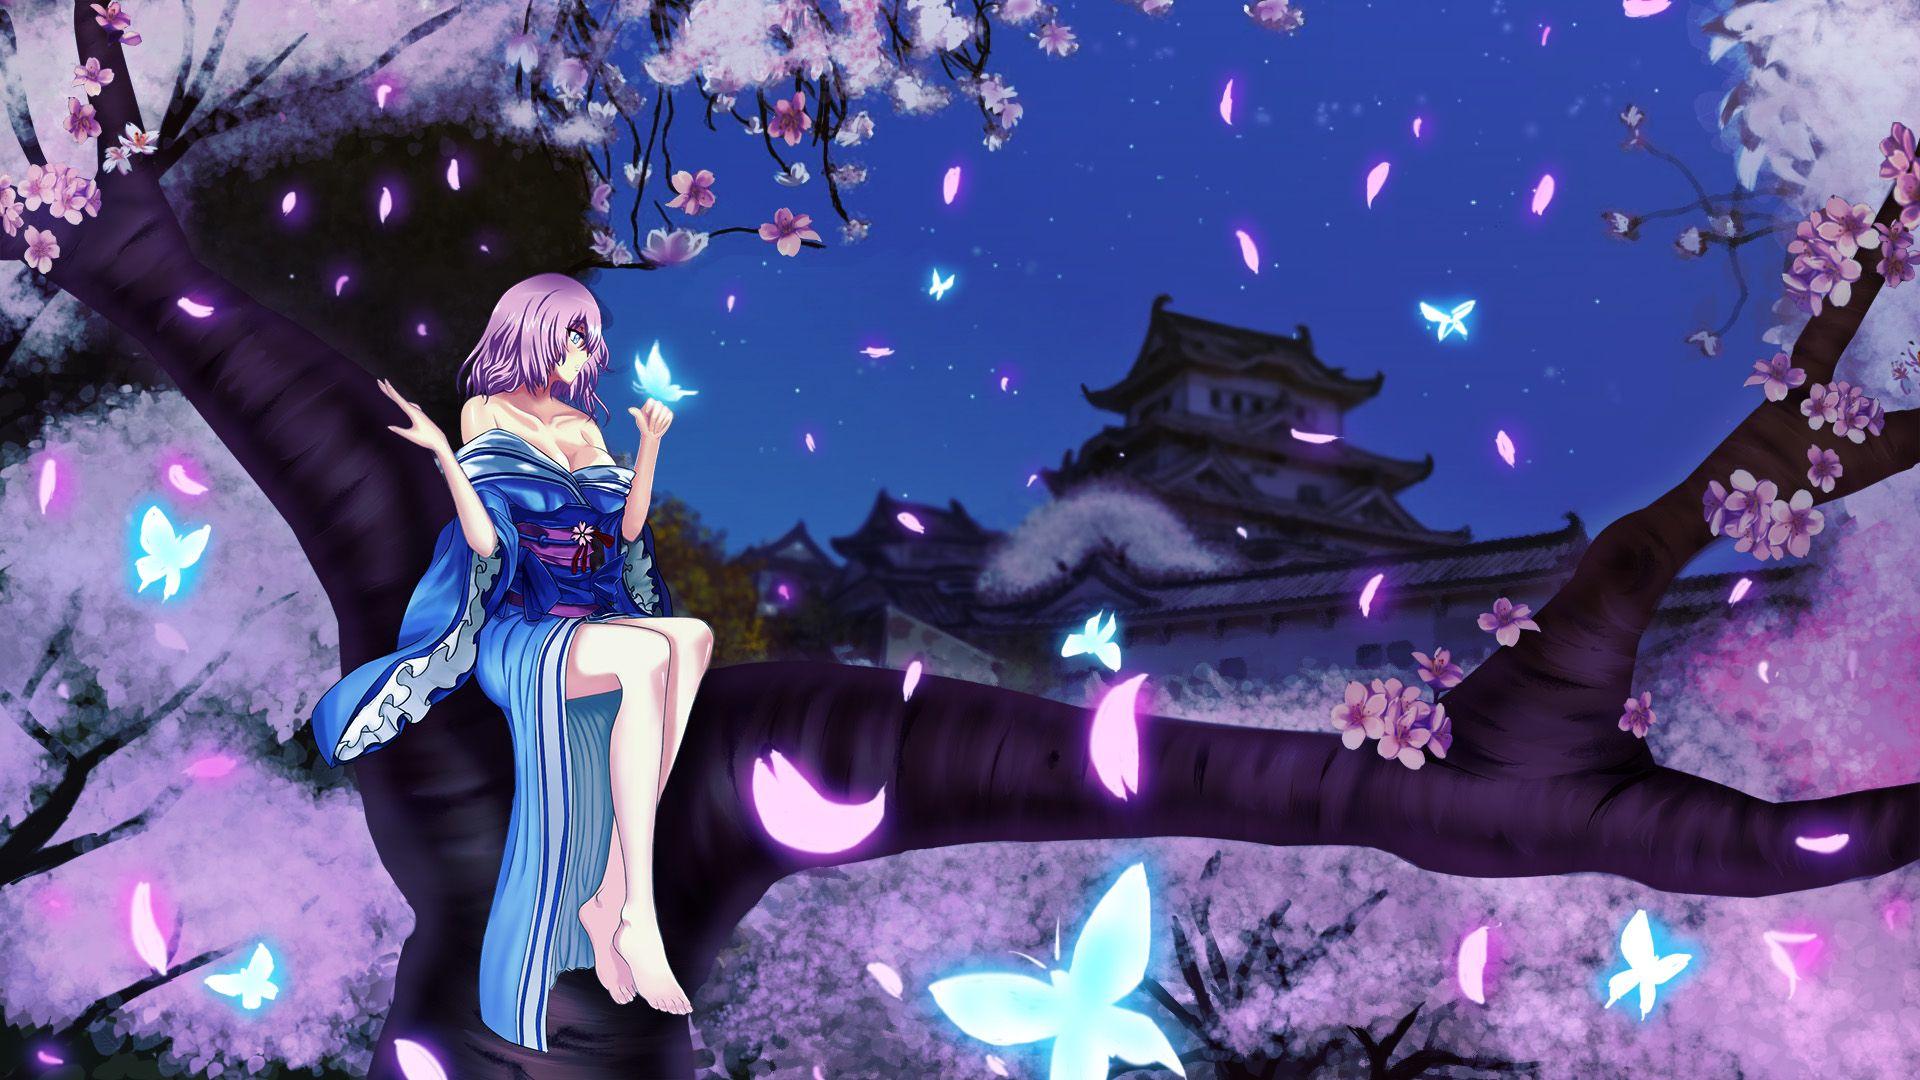 Video GamesTouhou Games Touhou Cherry Blossoms Flowers Blue Eyes Cleavage Kimono Purple Hair Saigyouji Yuyuko J Butterflies Wallpapers Free